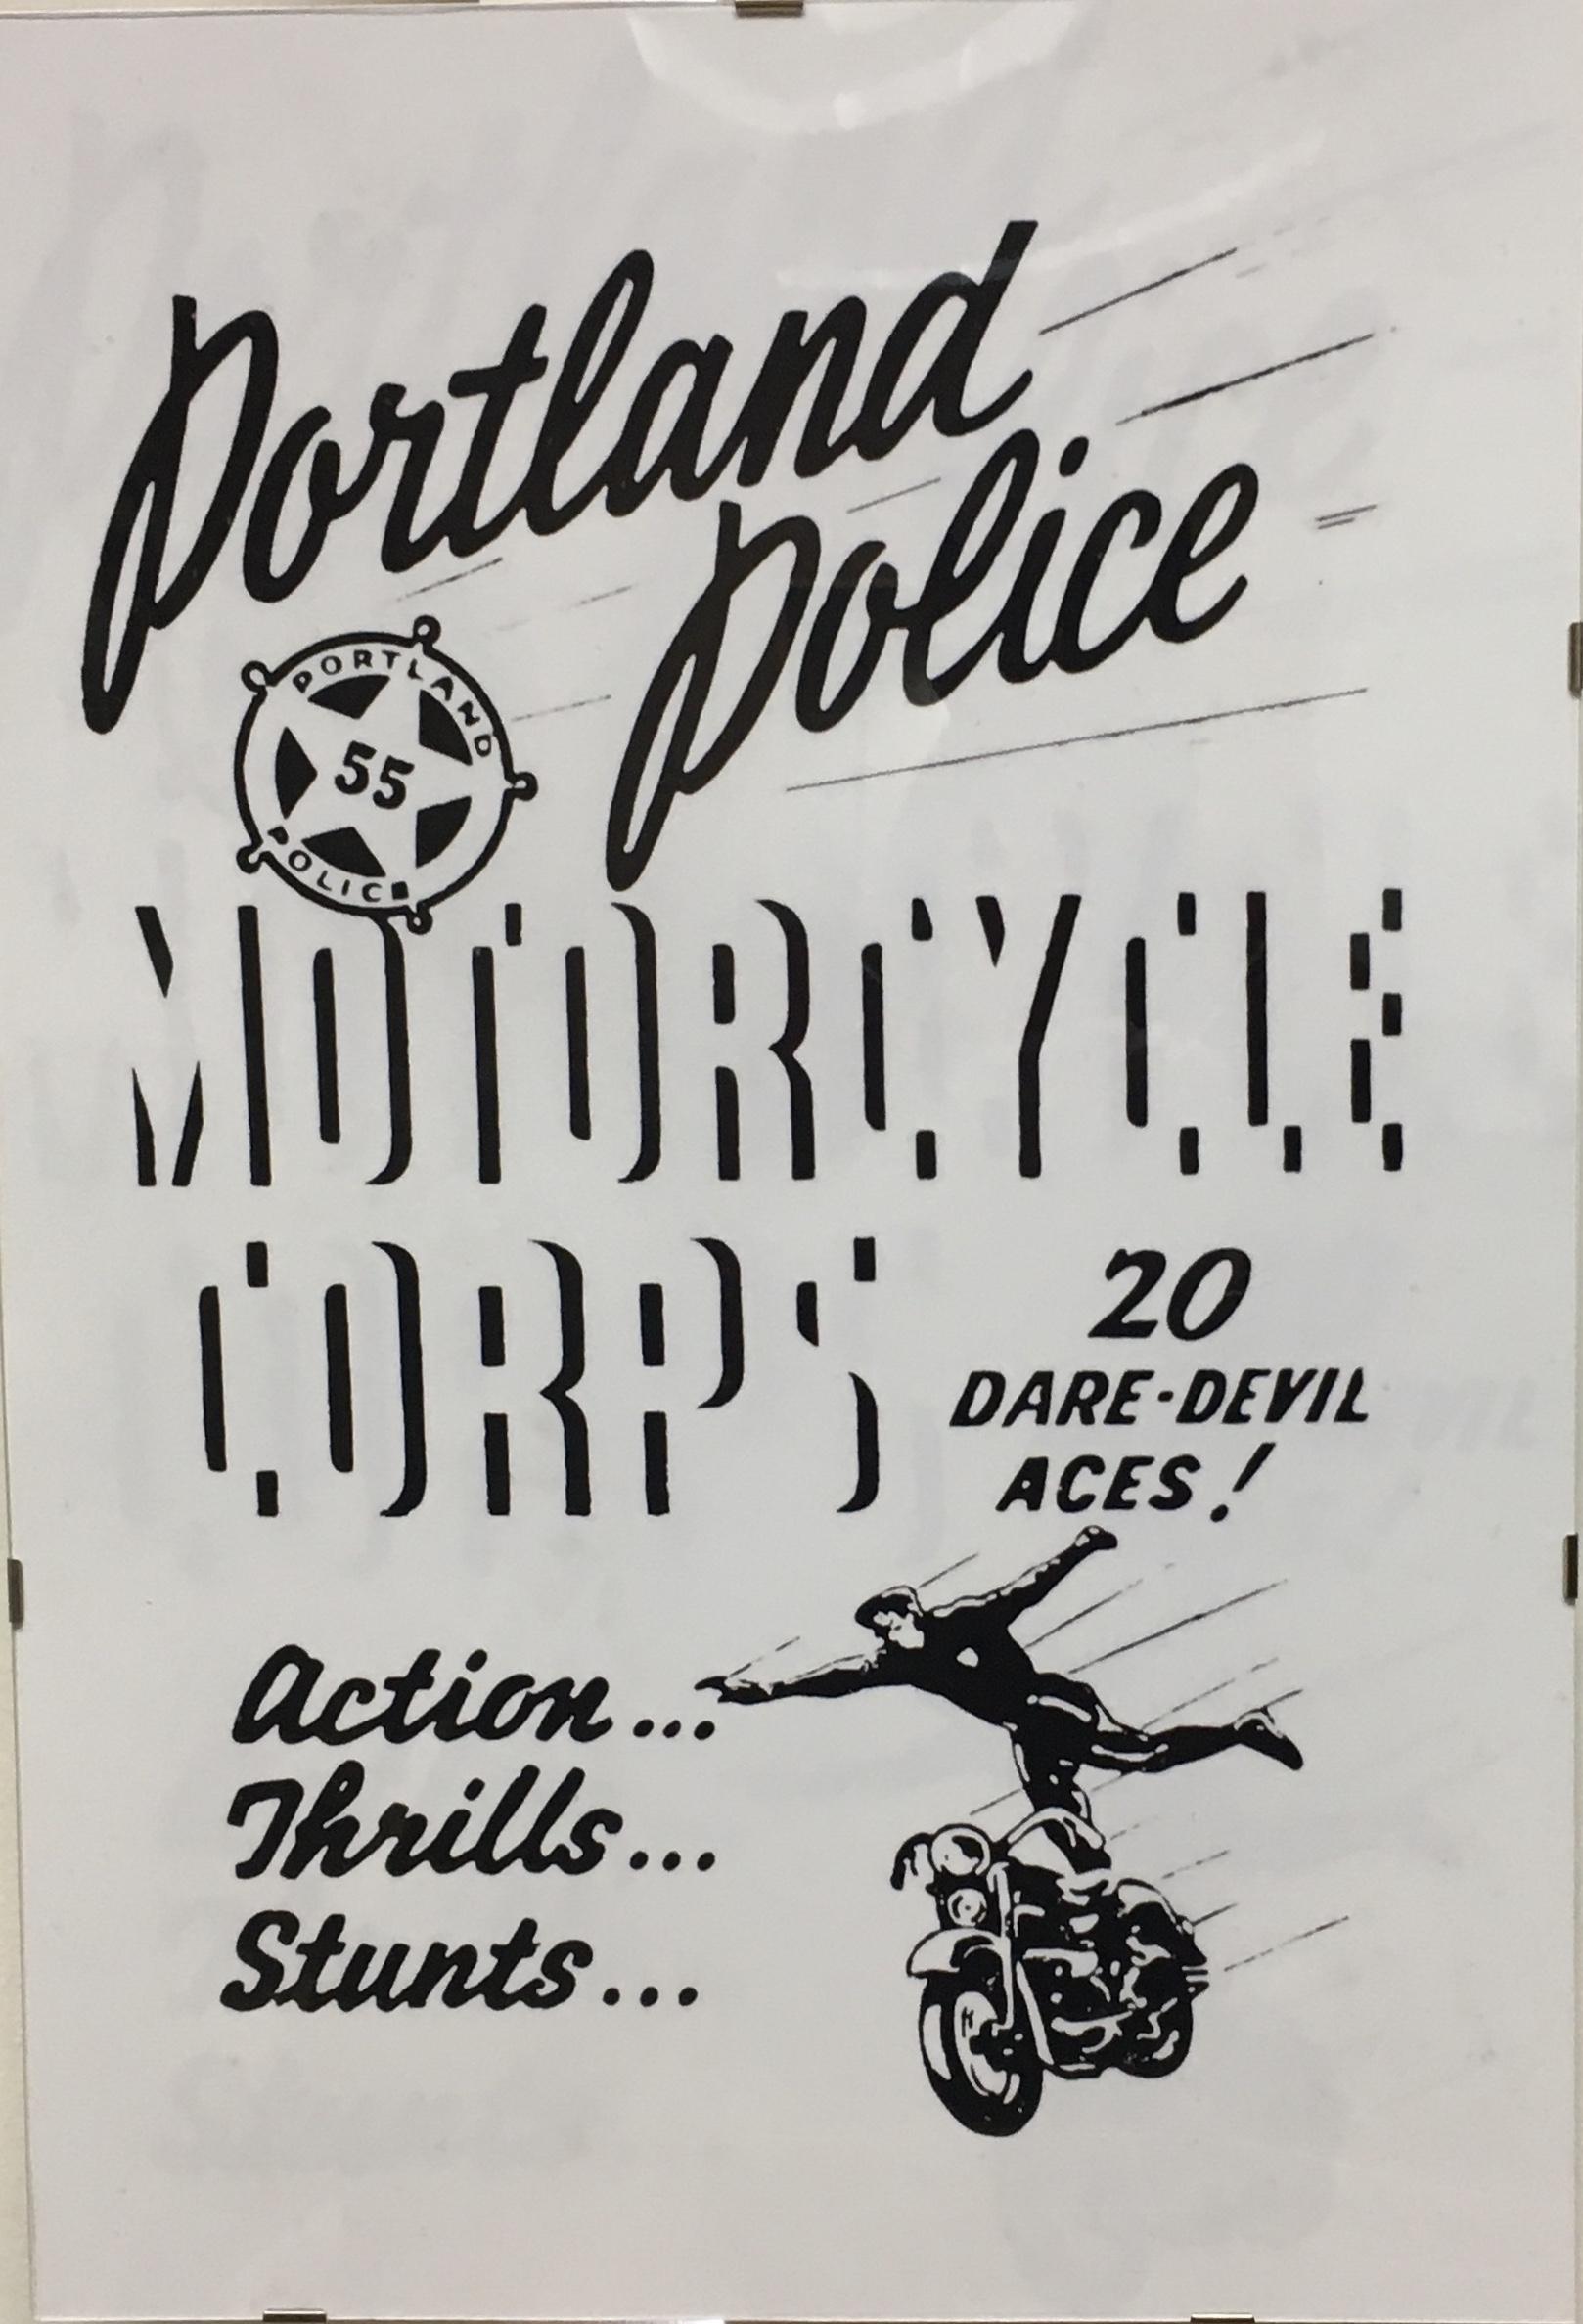 More Portland Police History